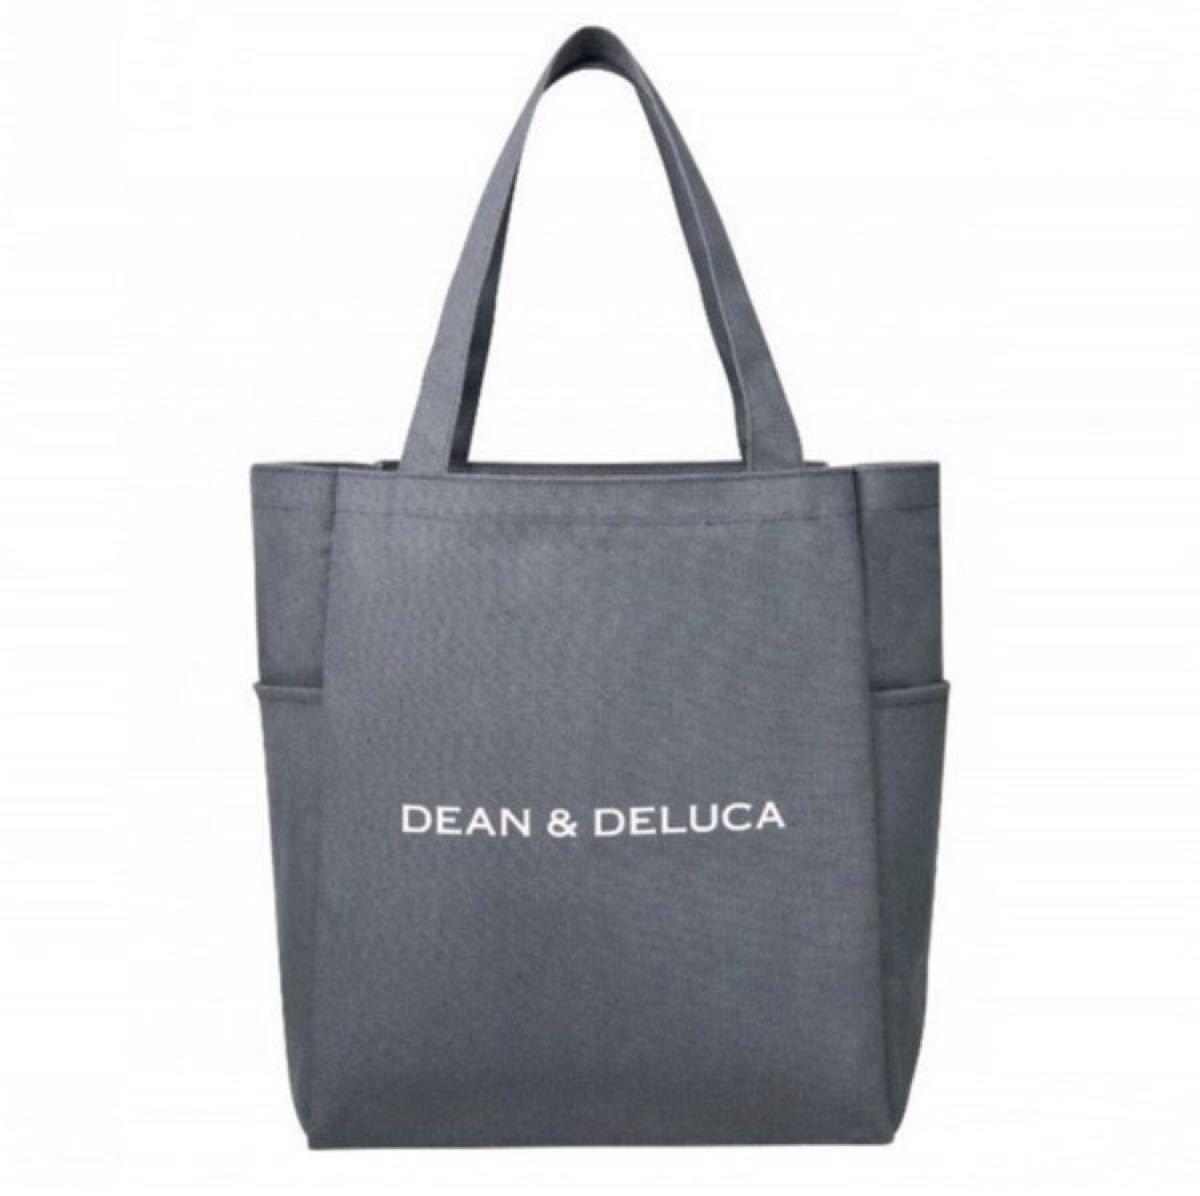 DEAN&DELUCA ディーンアンドデルーカ トートバッグ オトナミューズ エコバッグ